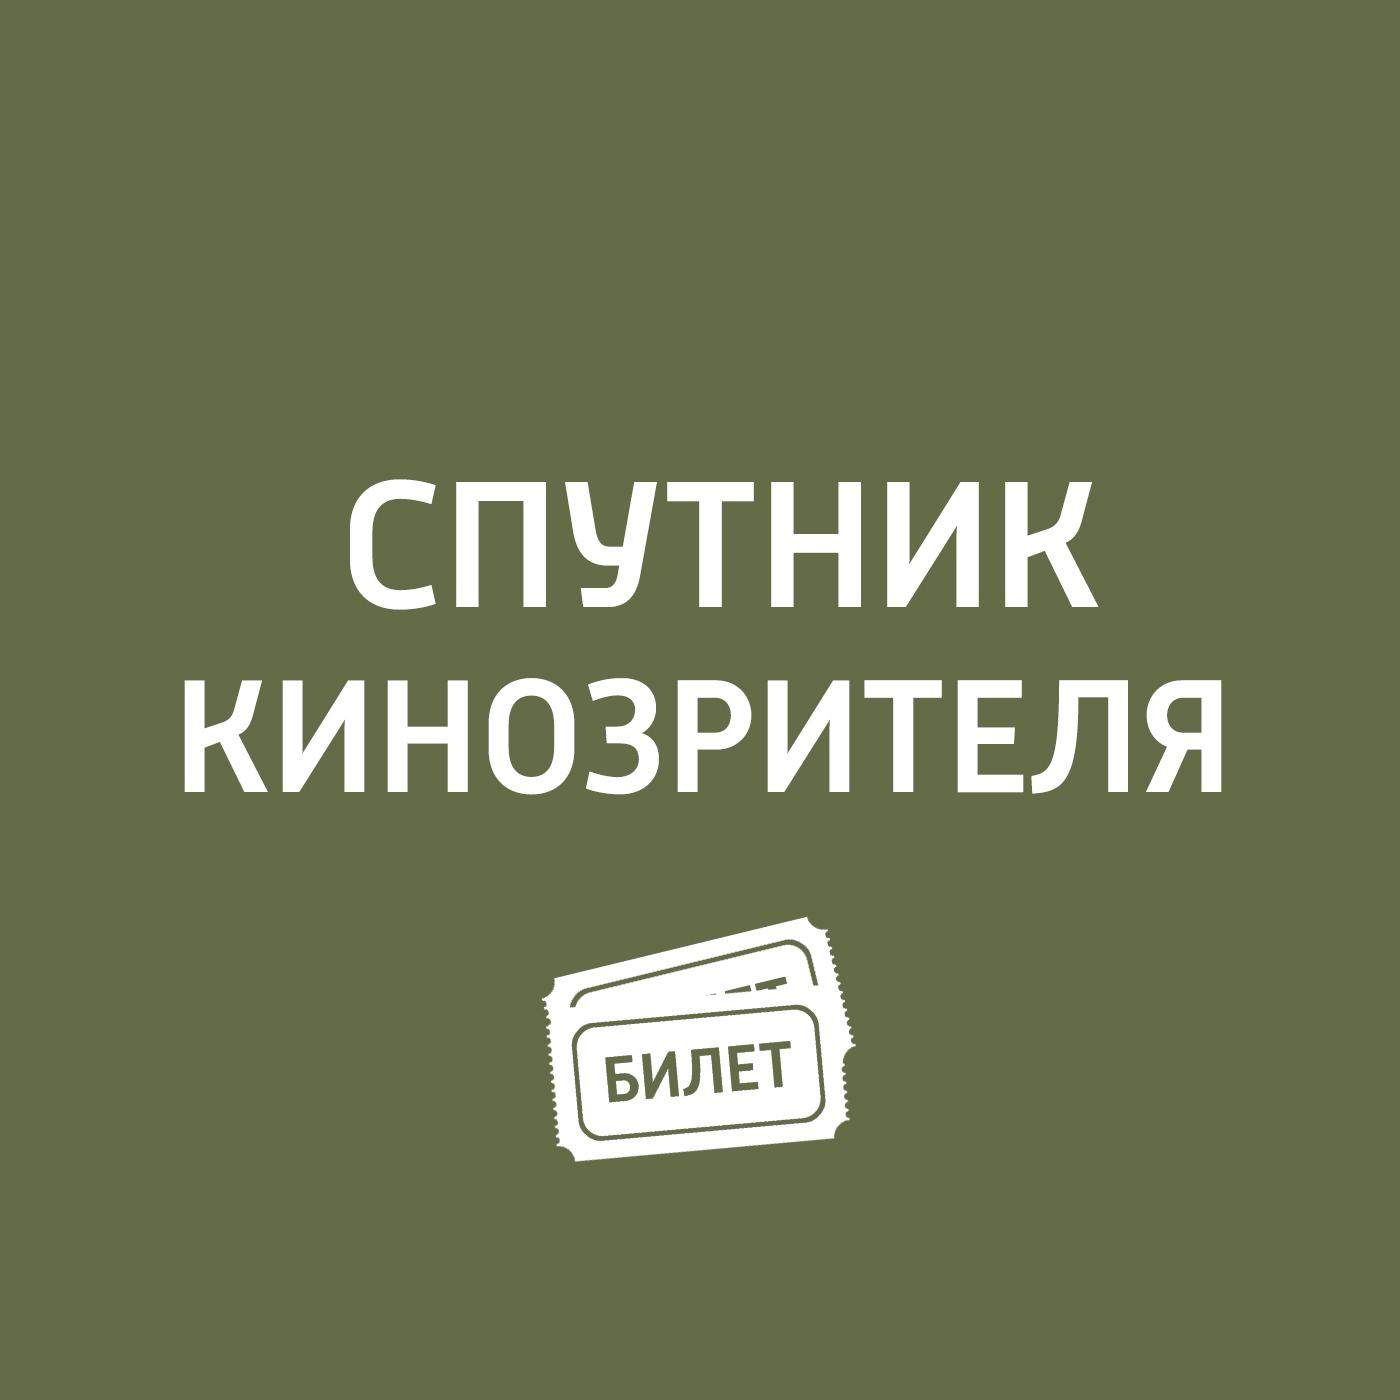 Антон Долин Премьеры. «Мобильник